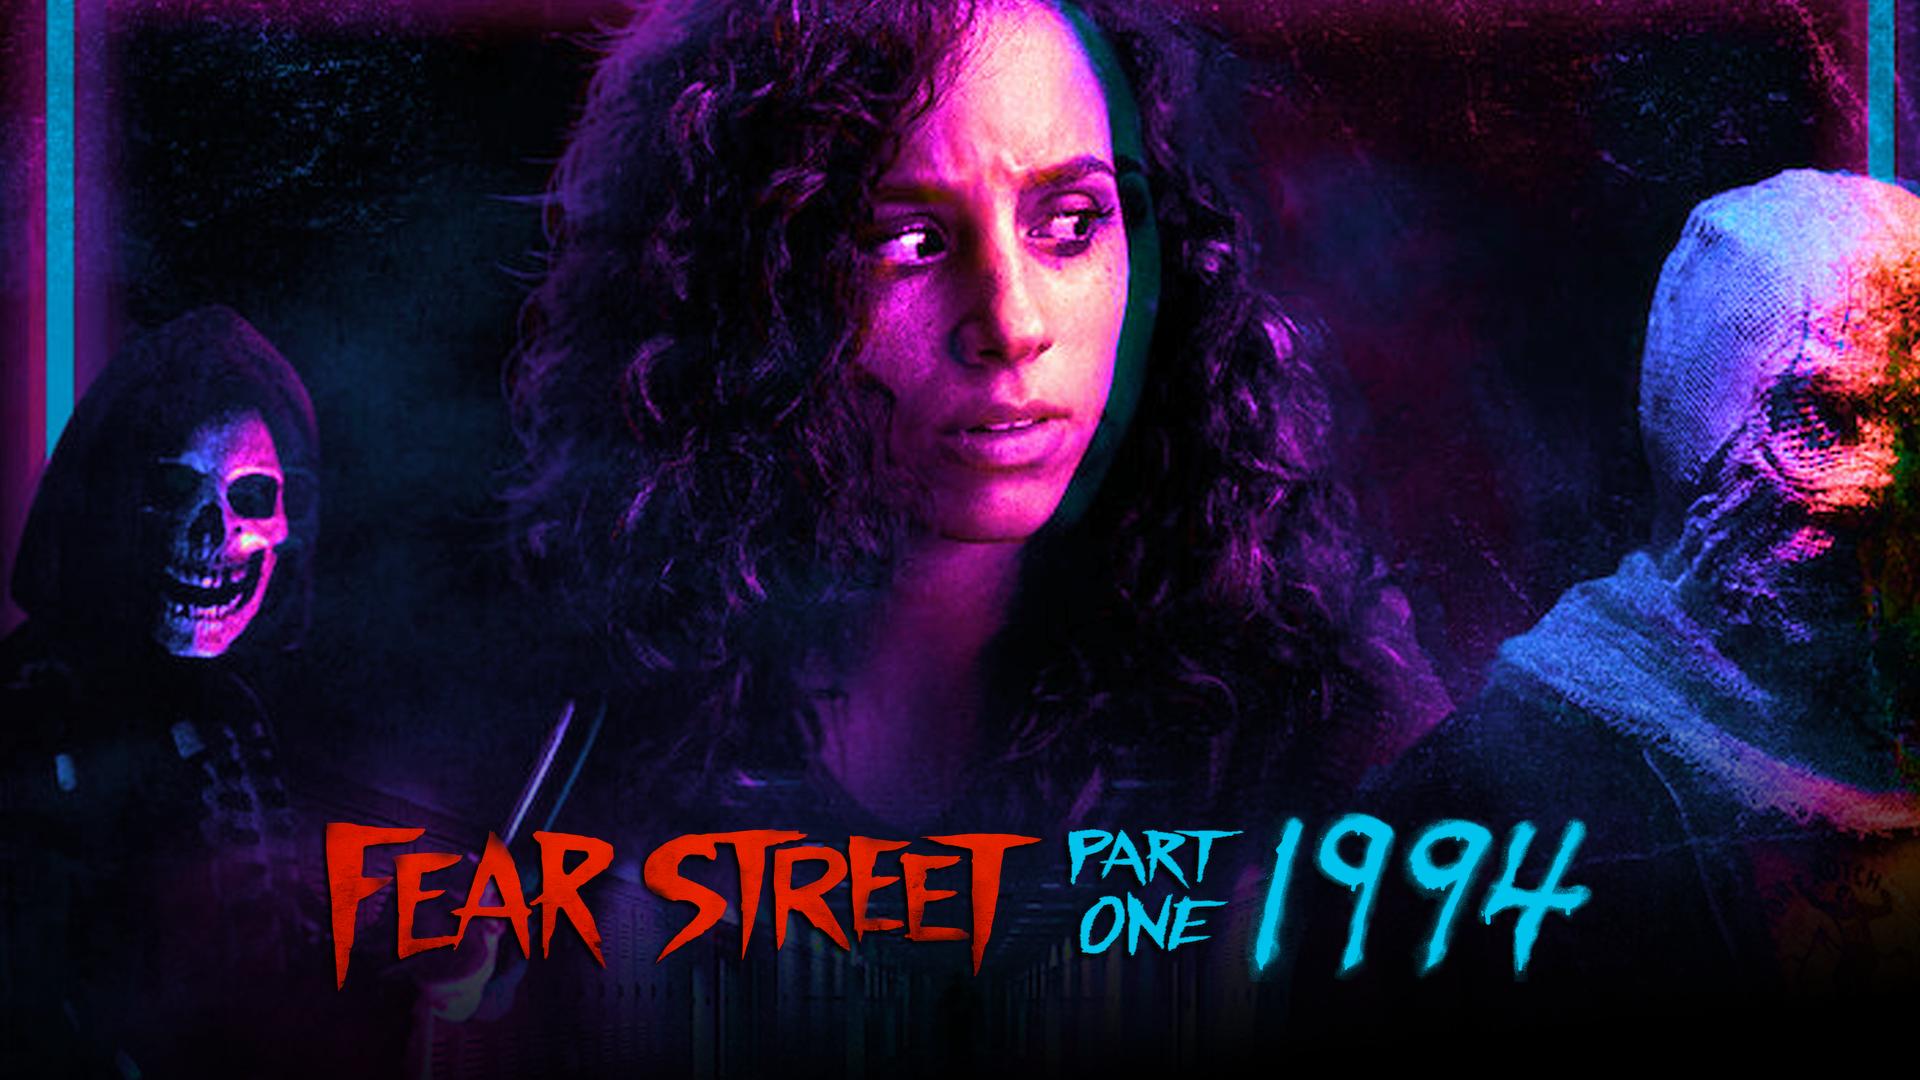 The first Fear Street is 90s horror fun